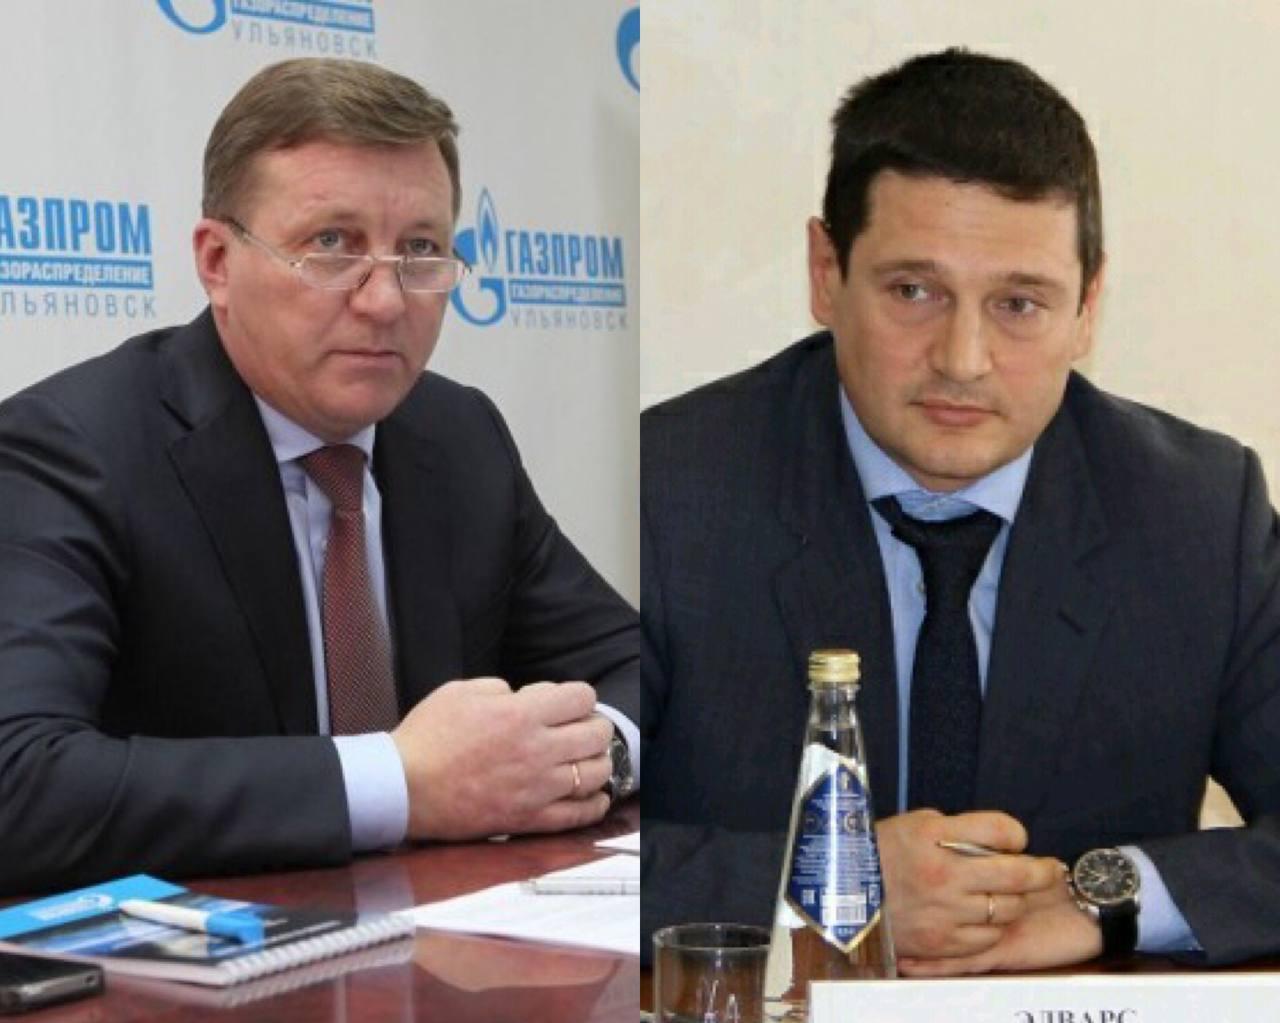 Перестановки в комитетах ЗСО: Эдварс и Камеко заменили Трубчанина